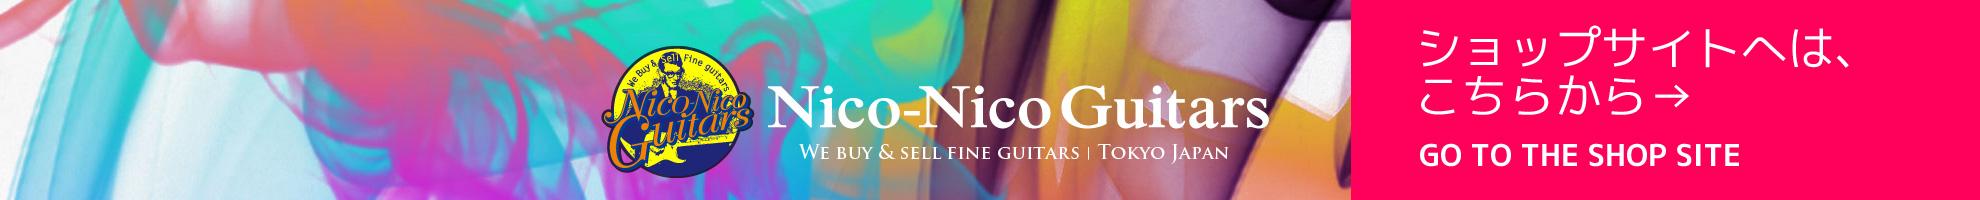 niconico guitars blog banner